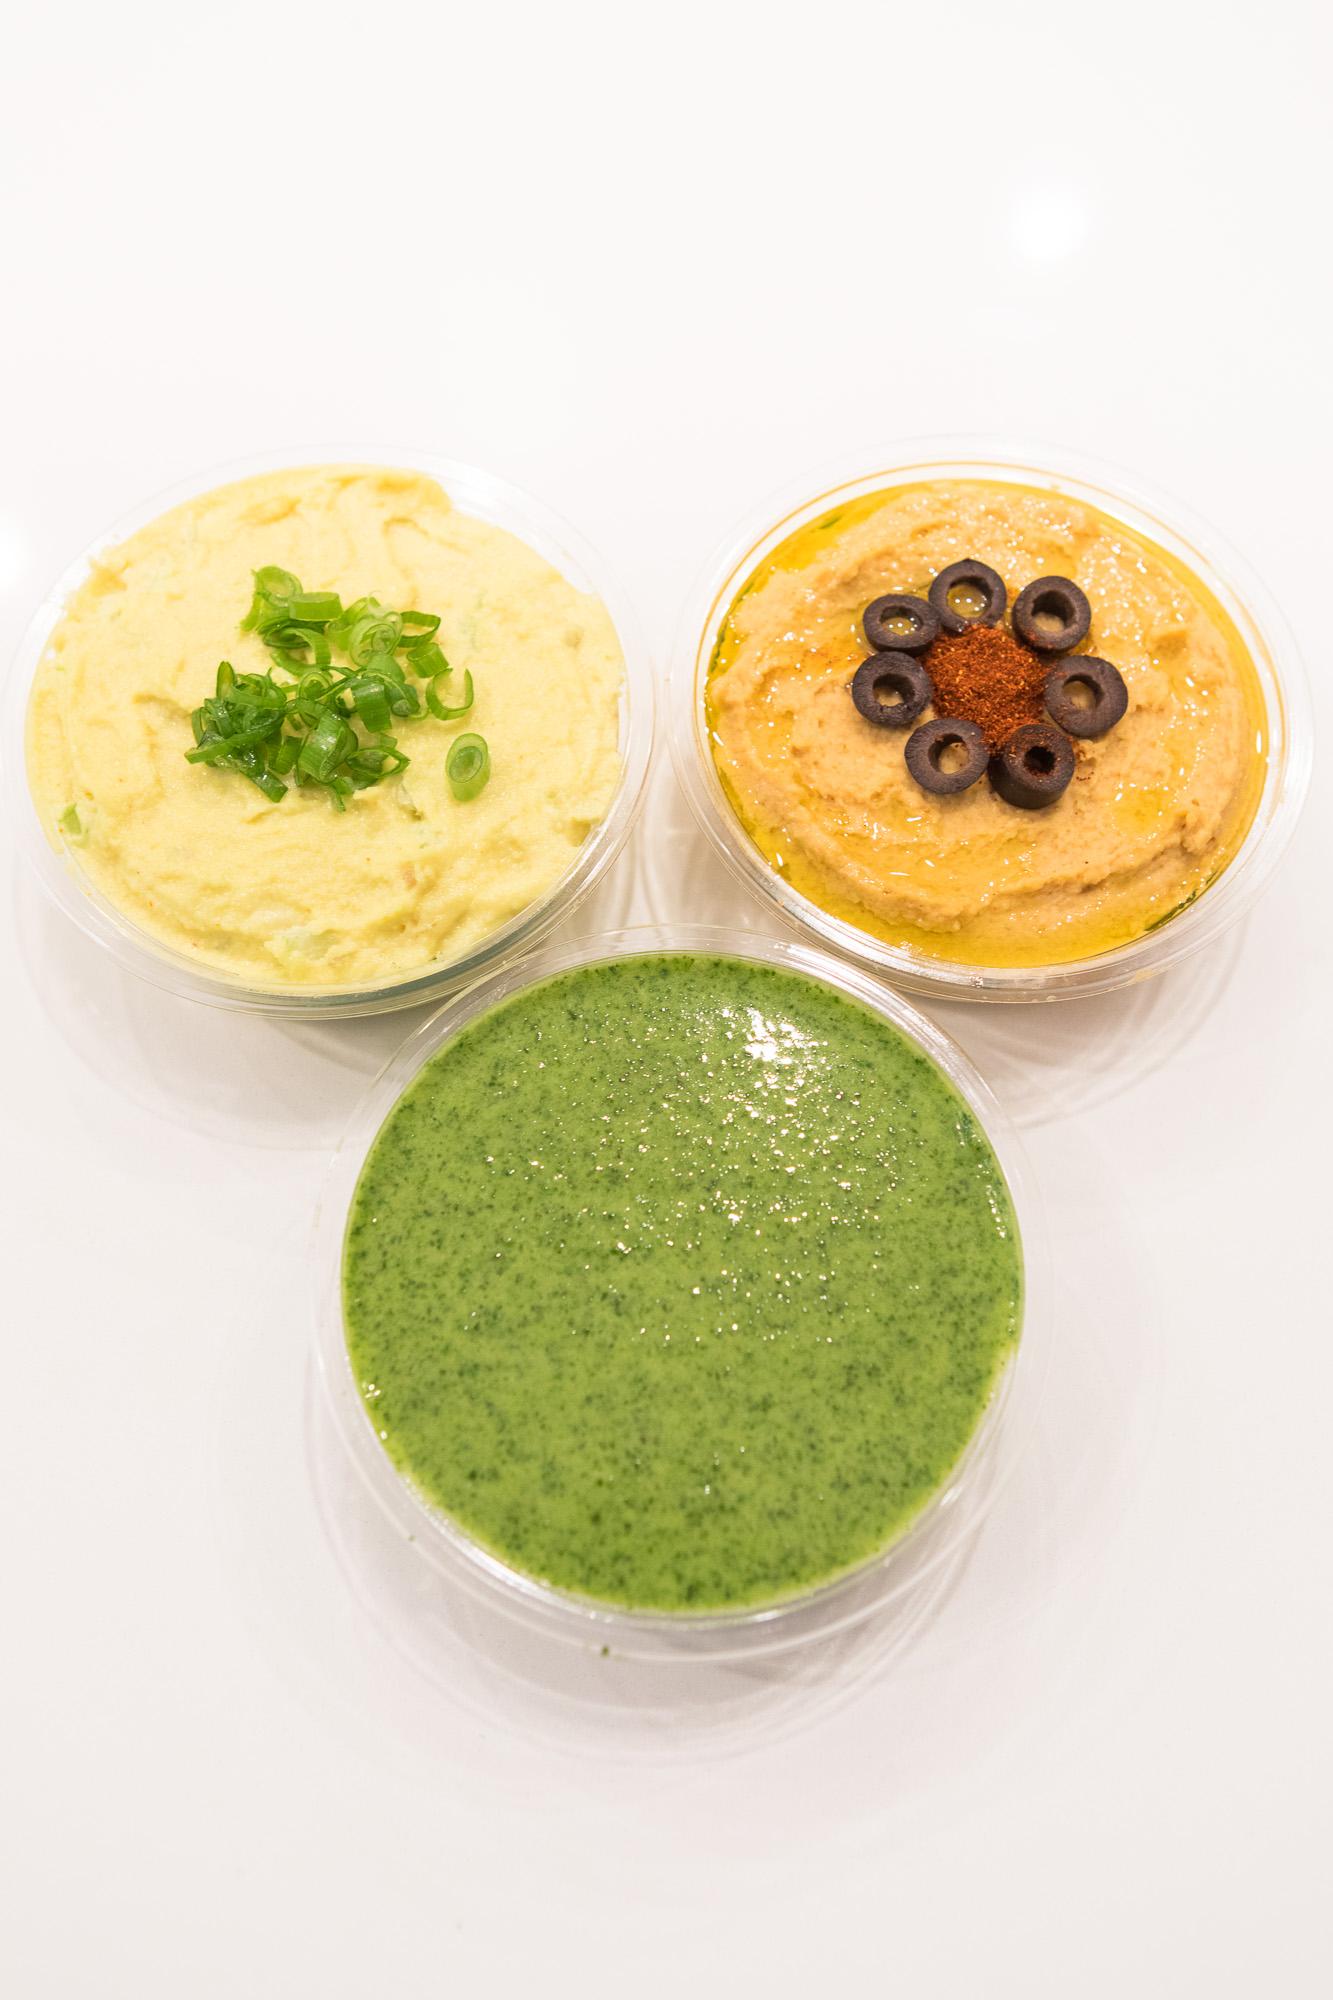 Maka-vegan-cafe-paia-maui-hummus-collection-1.jpg